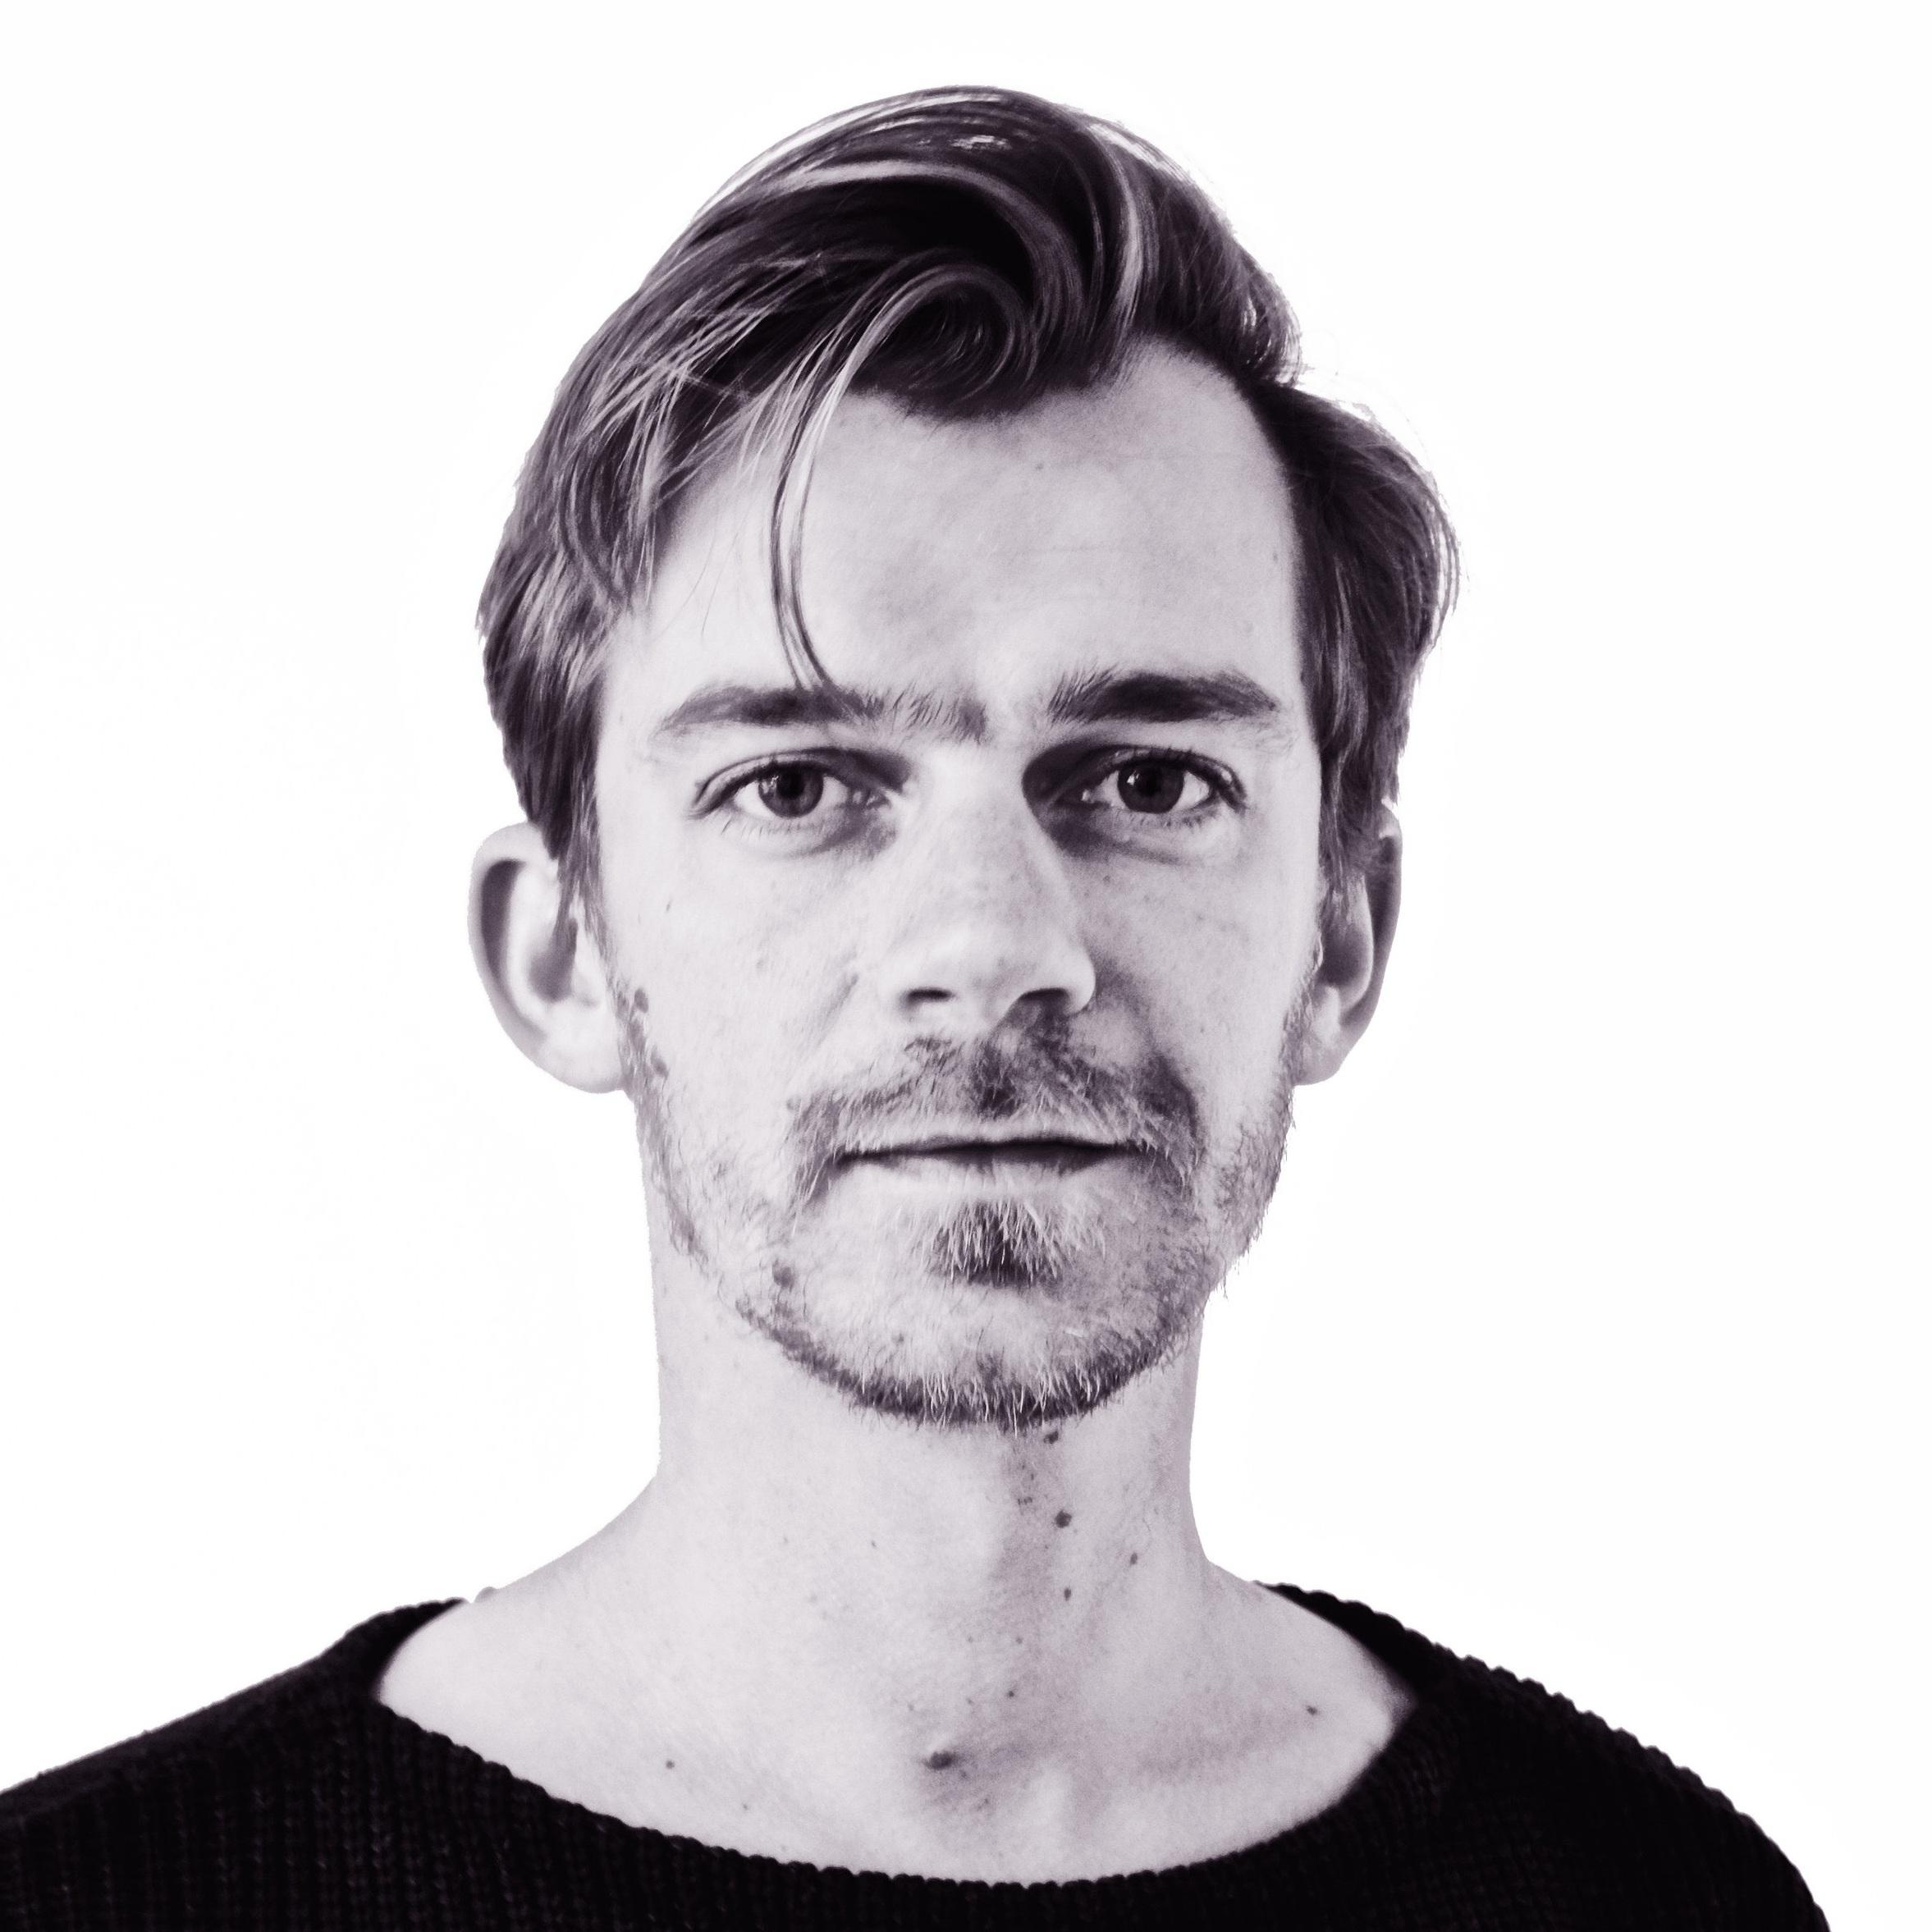 Simon de Koning - CEO - PRODUCTsimon@hiteleven.com